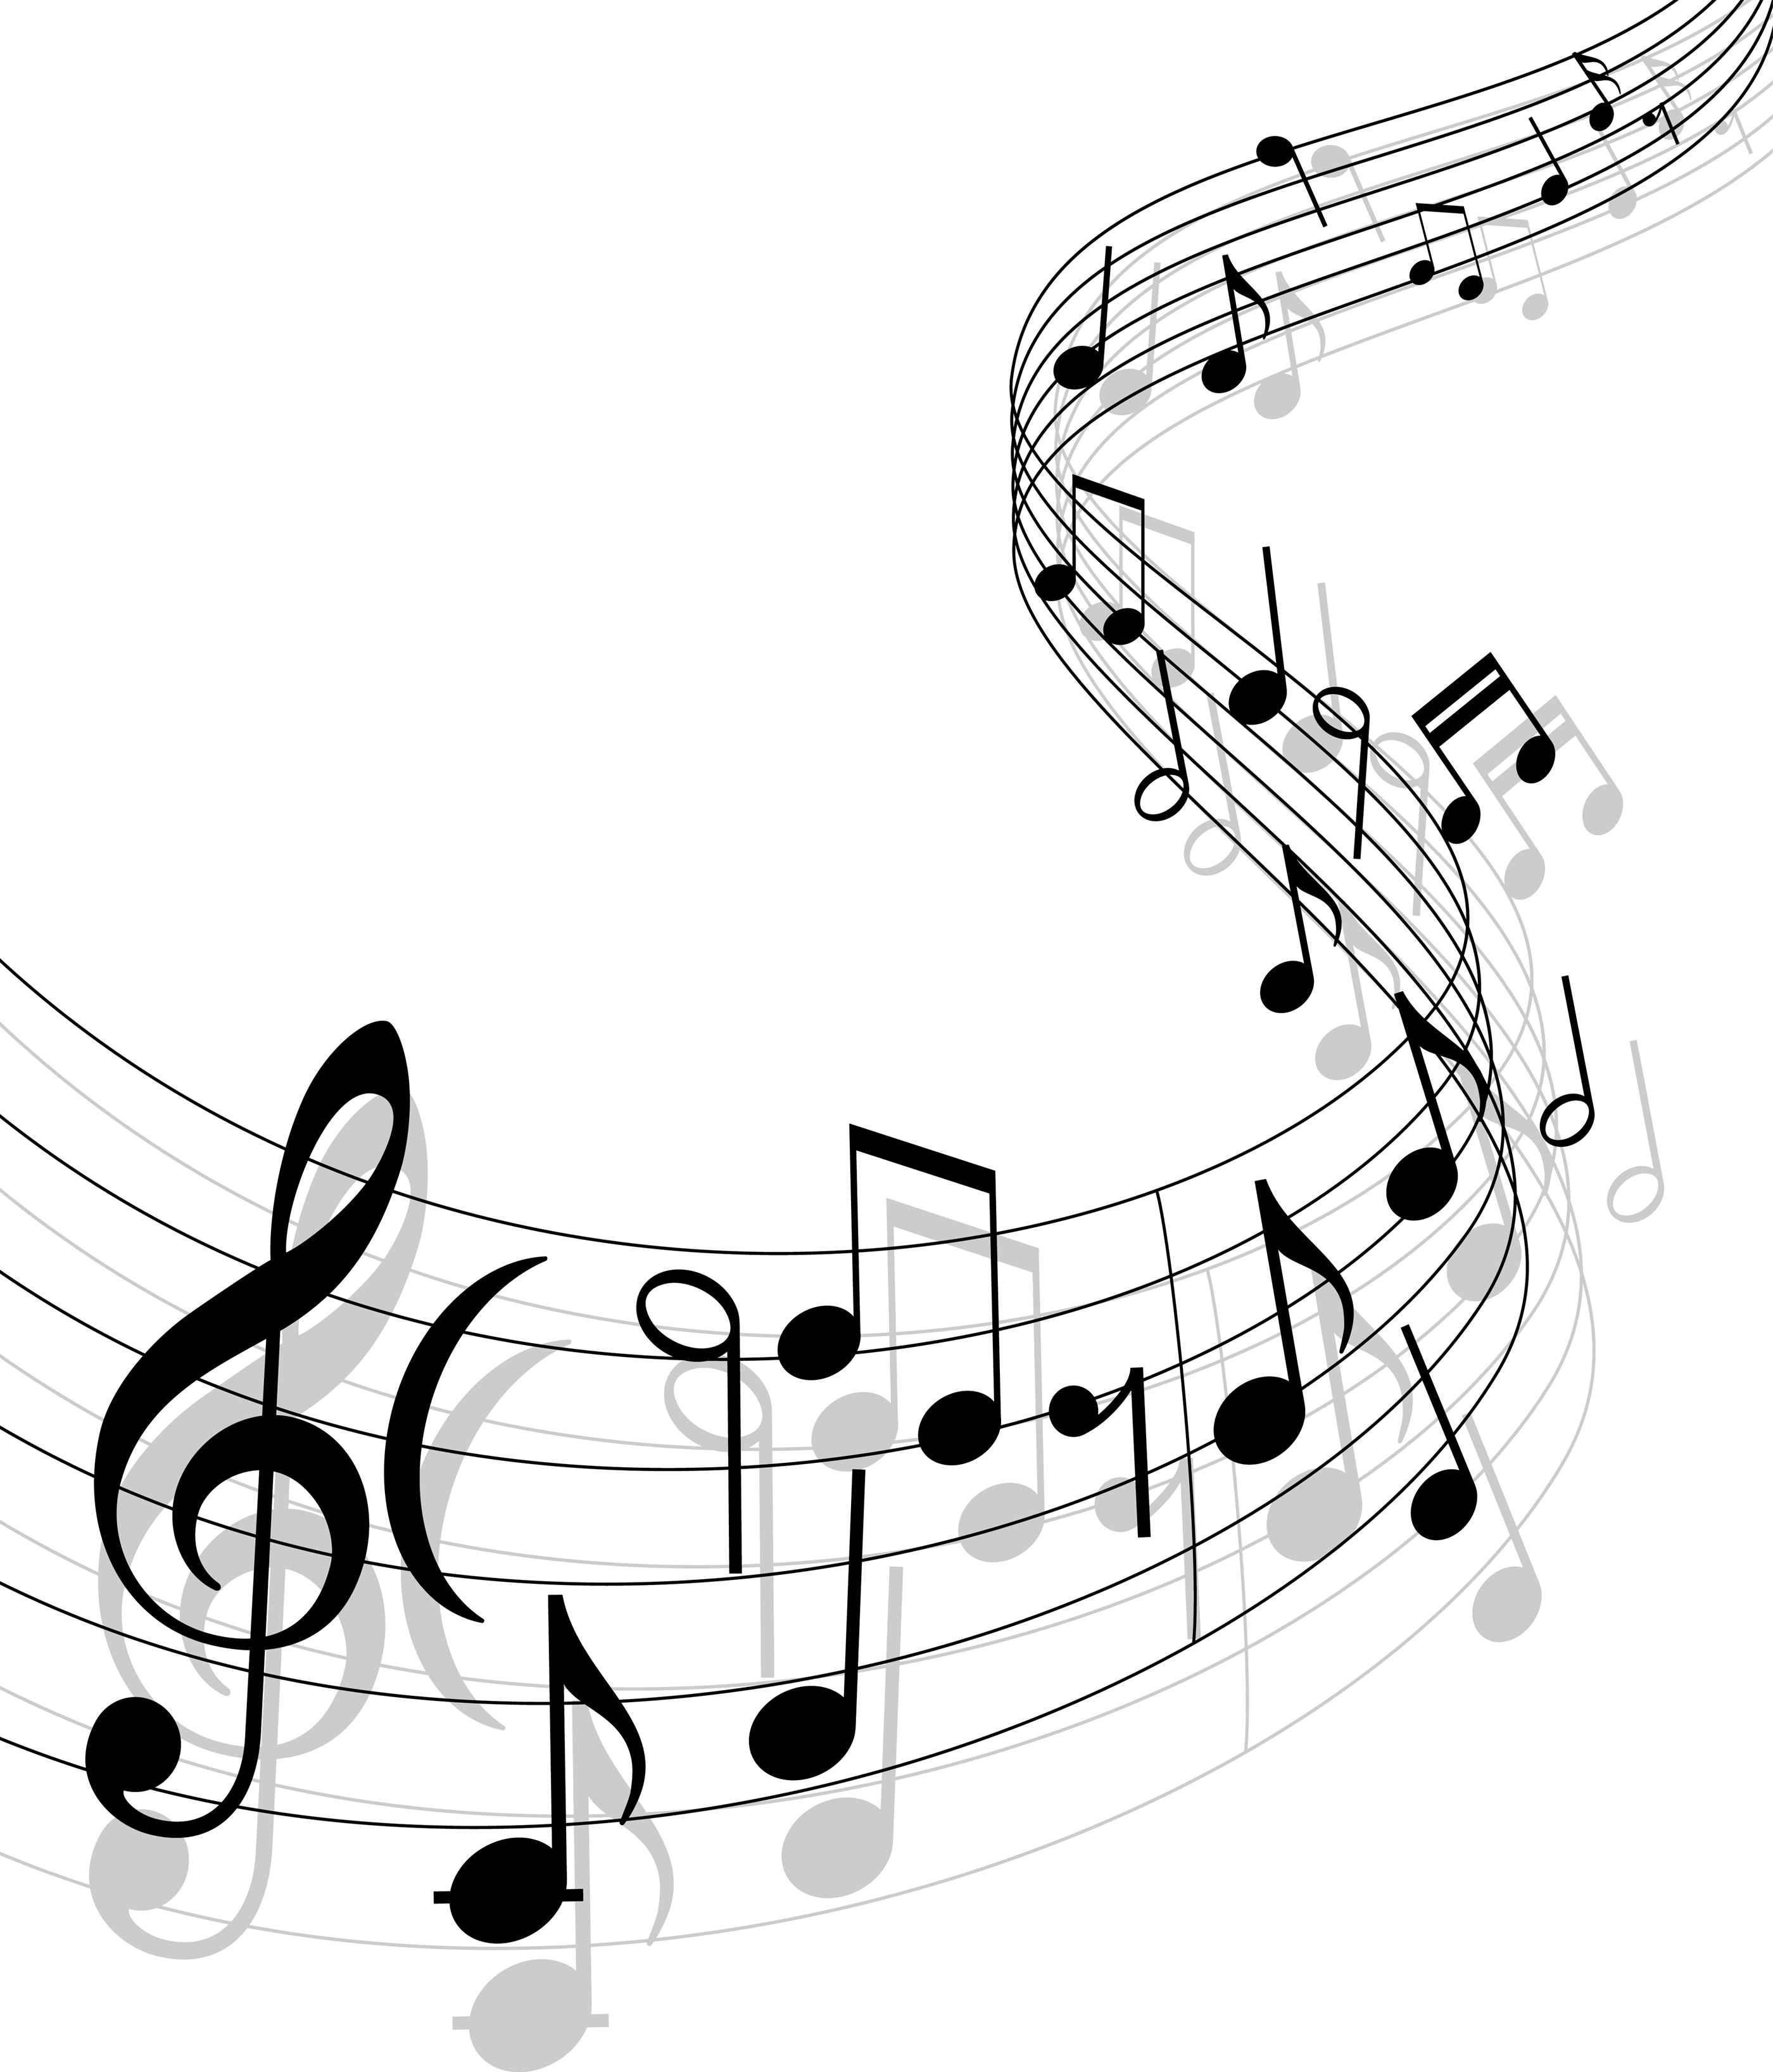 music note gospel musical notes clipart [ 2800 x 3272 Pixel ]